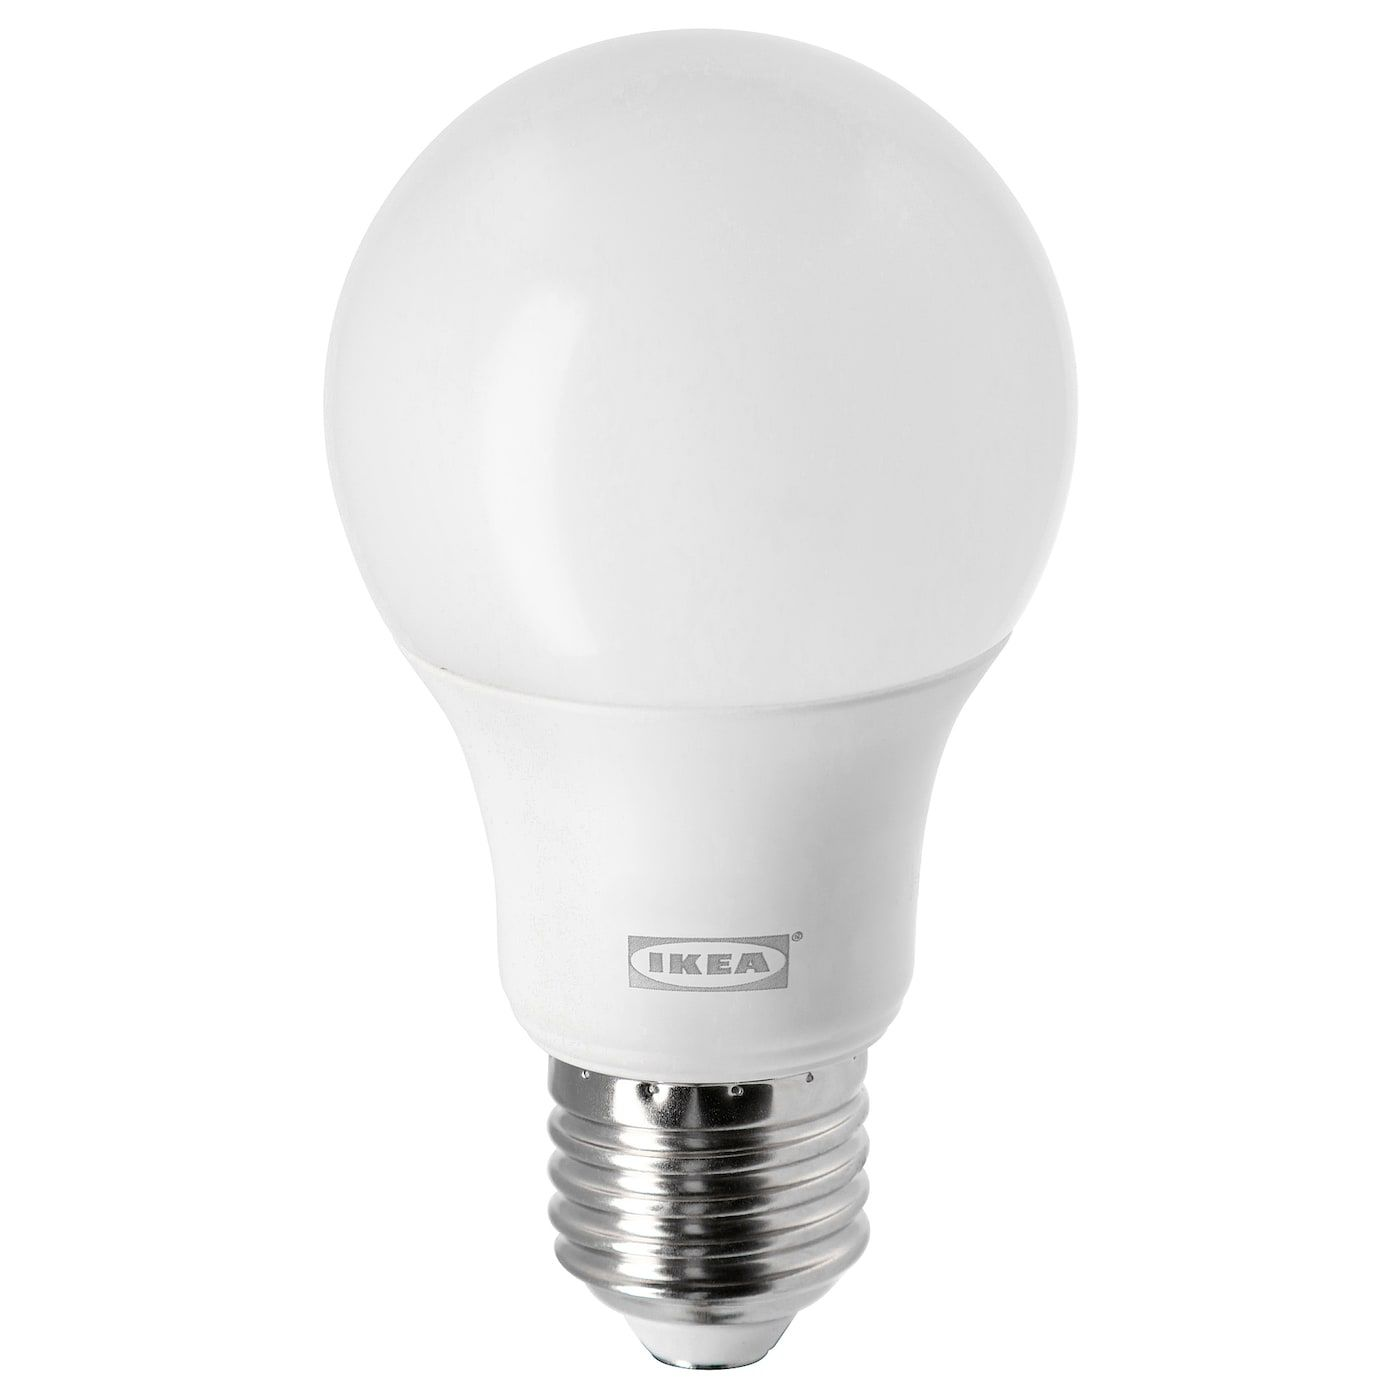 Ledare Led Leuchtmittel E27 806 Lm Dimmbar Warm Rund Opalweiss Ikea Osterreich In 2020 Led Bulb Bulb Pendant Lamp